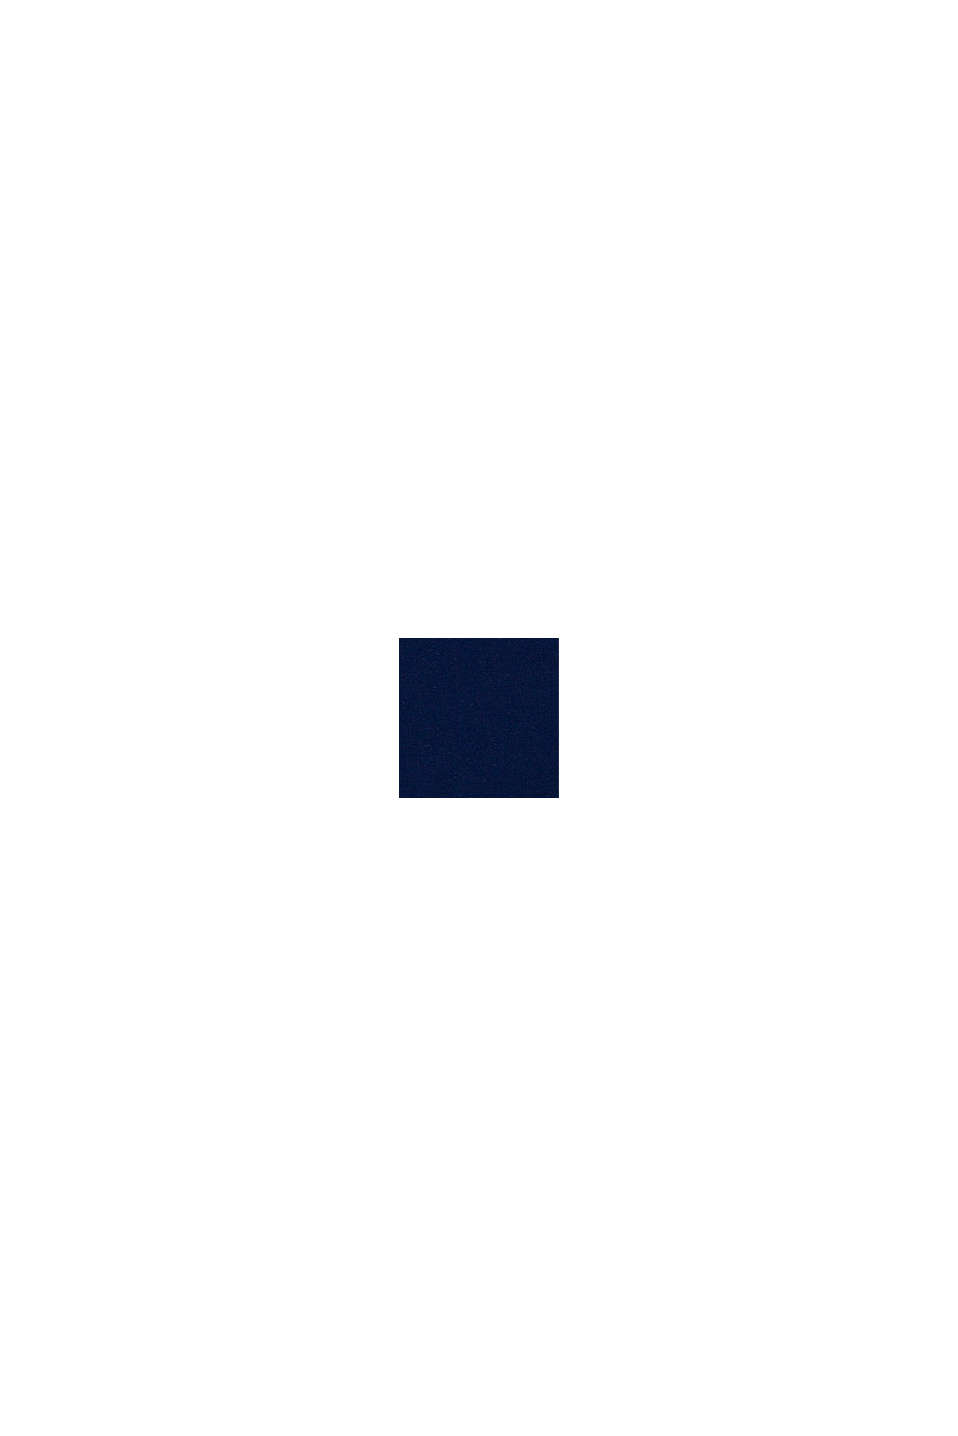 Pantalon de jogging en coton bio, BLUE, swatch